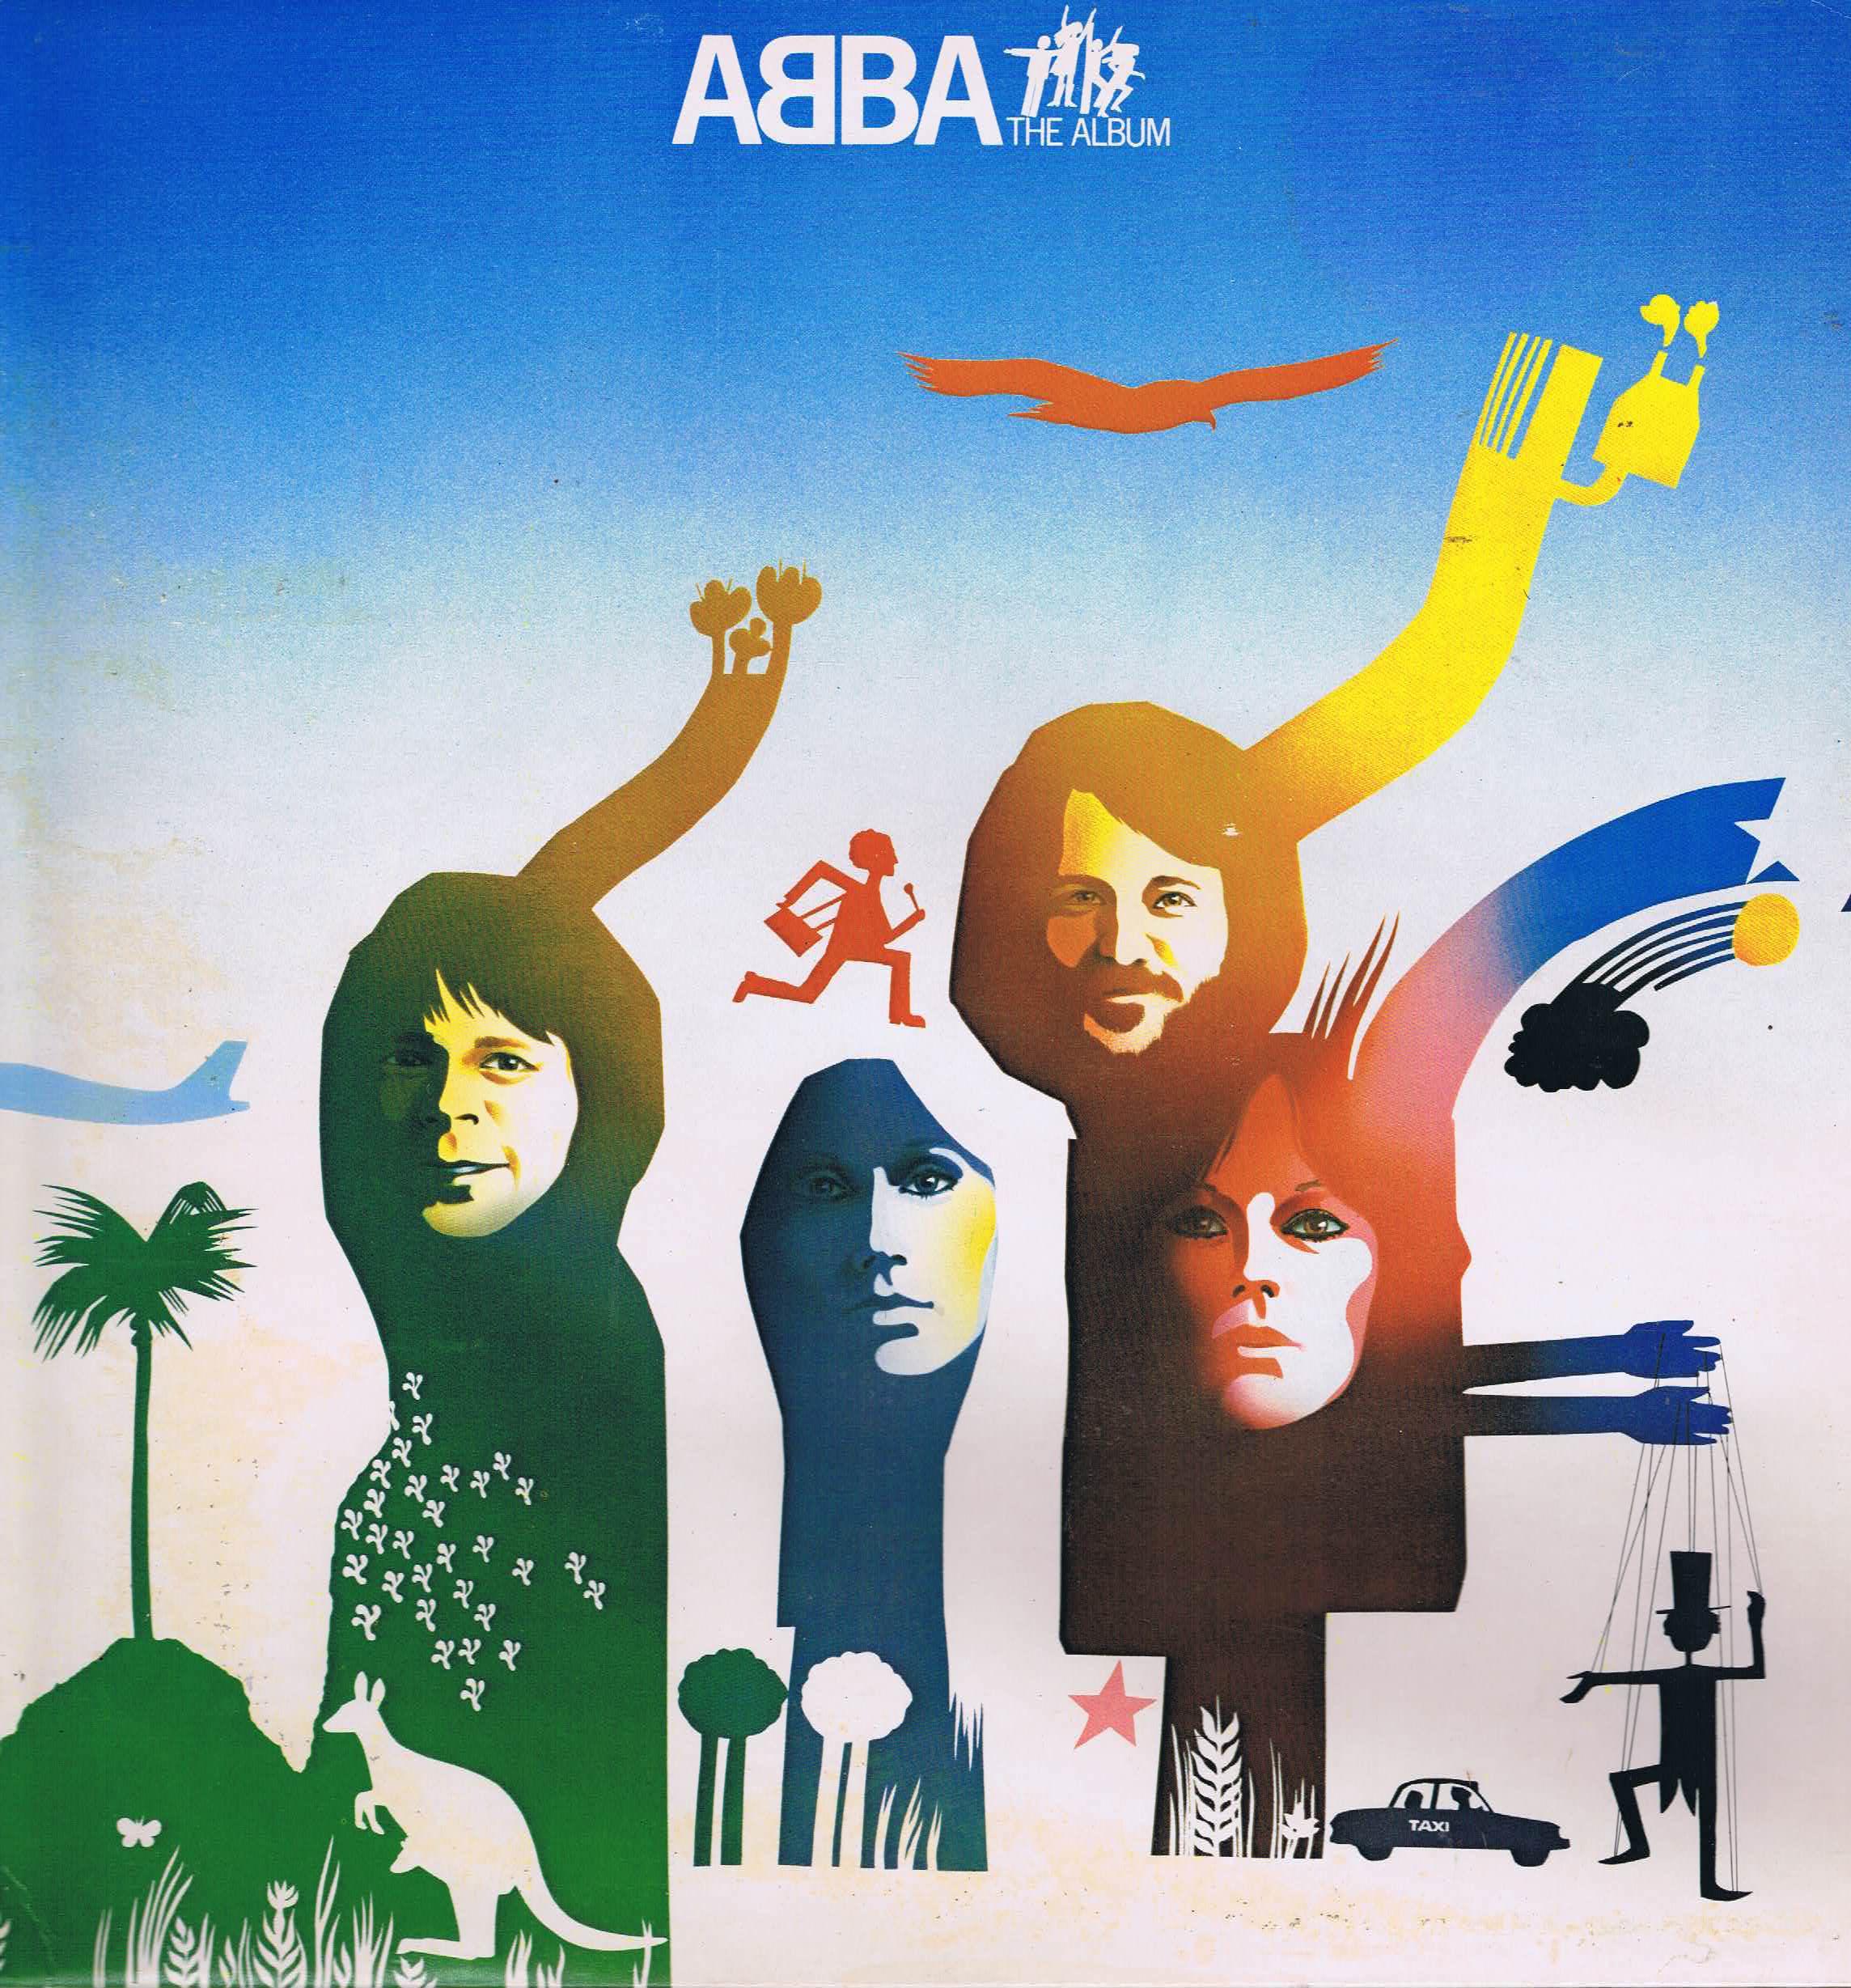 Abba The Album Epc 86052 Promo Lp Vinyl Record Wax